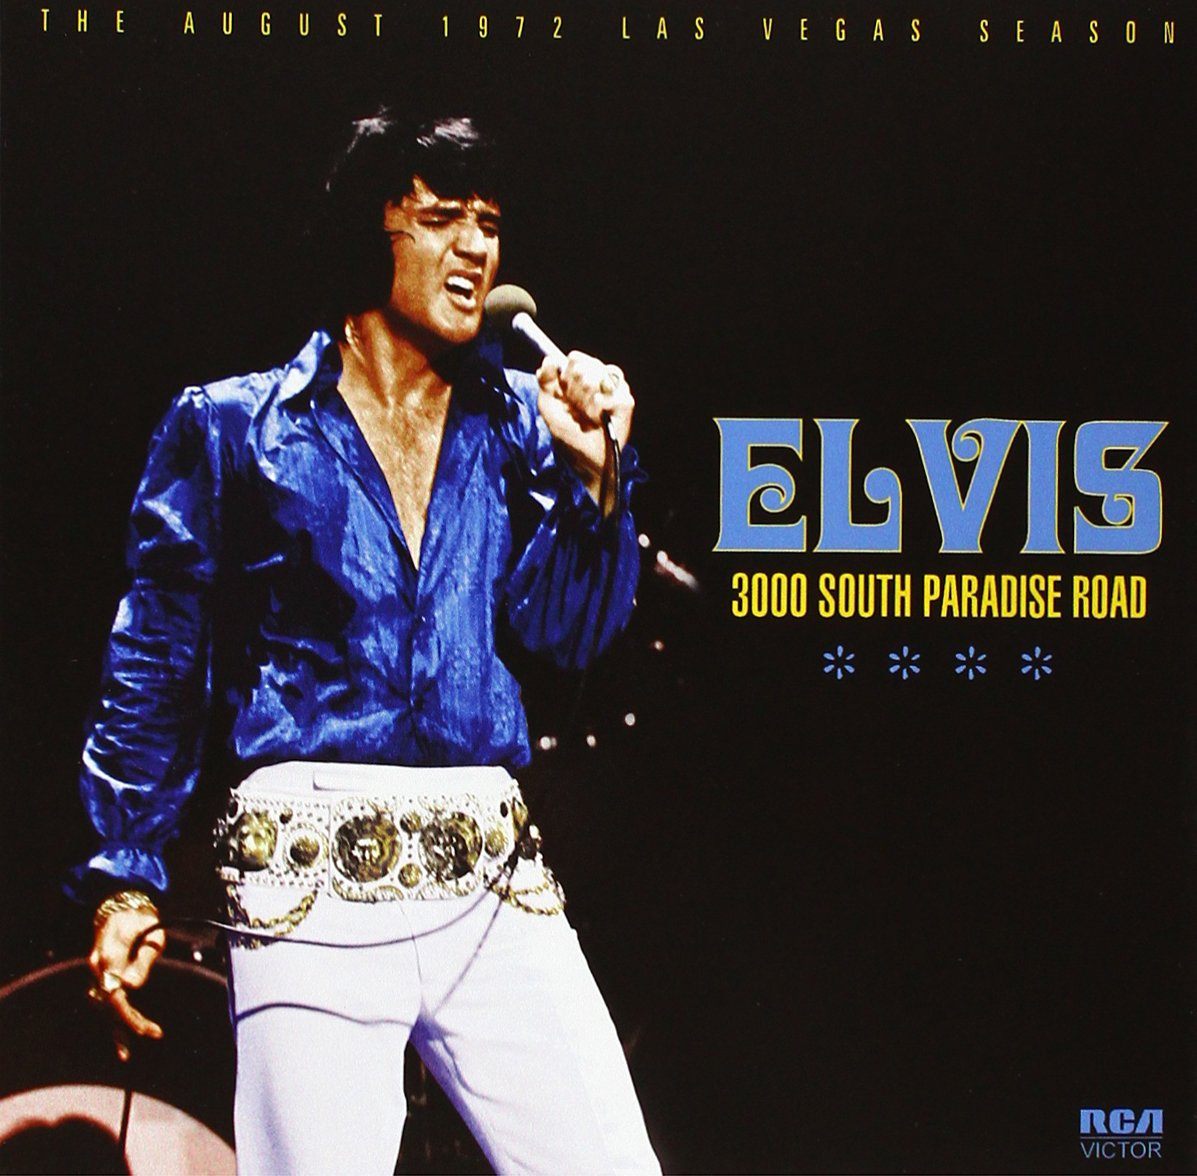 elvis presley 3000 south paradise road the august 1972 las vegas